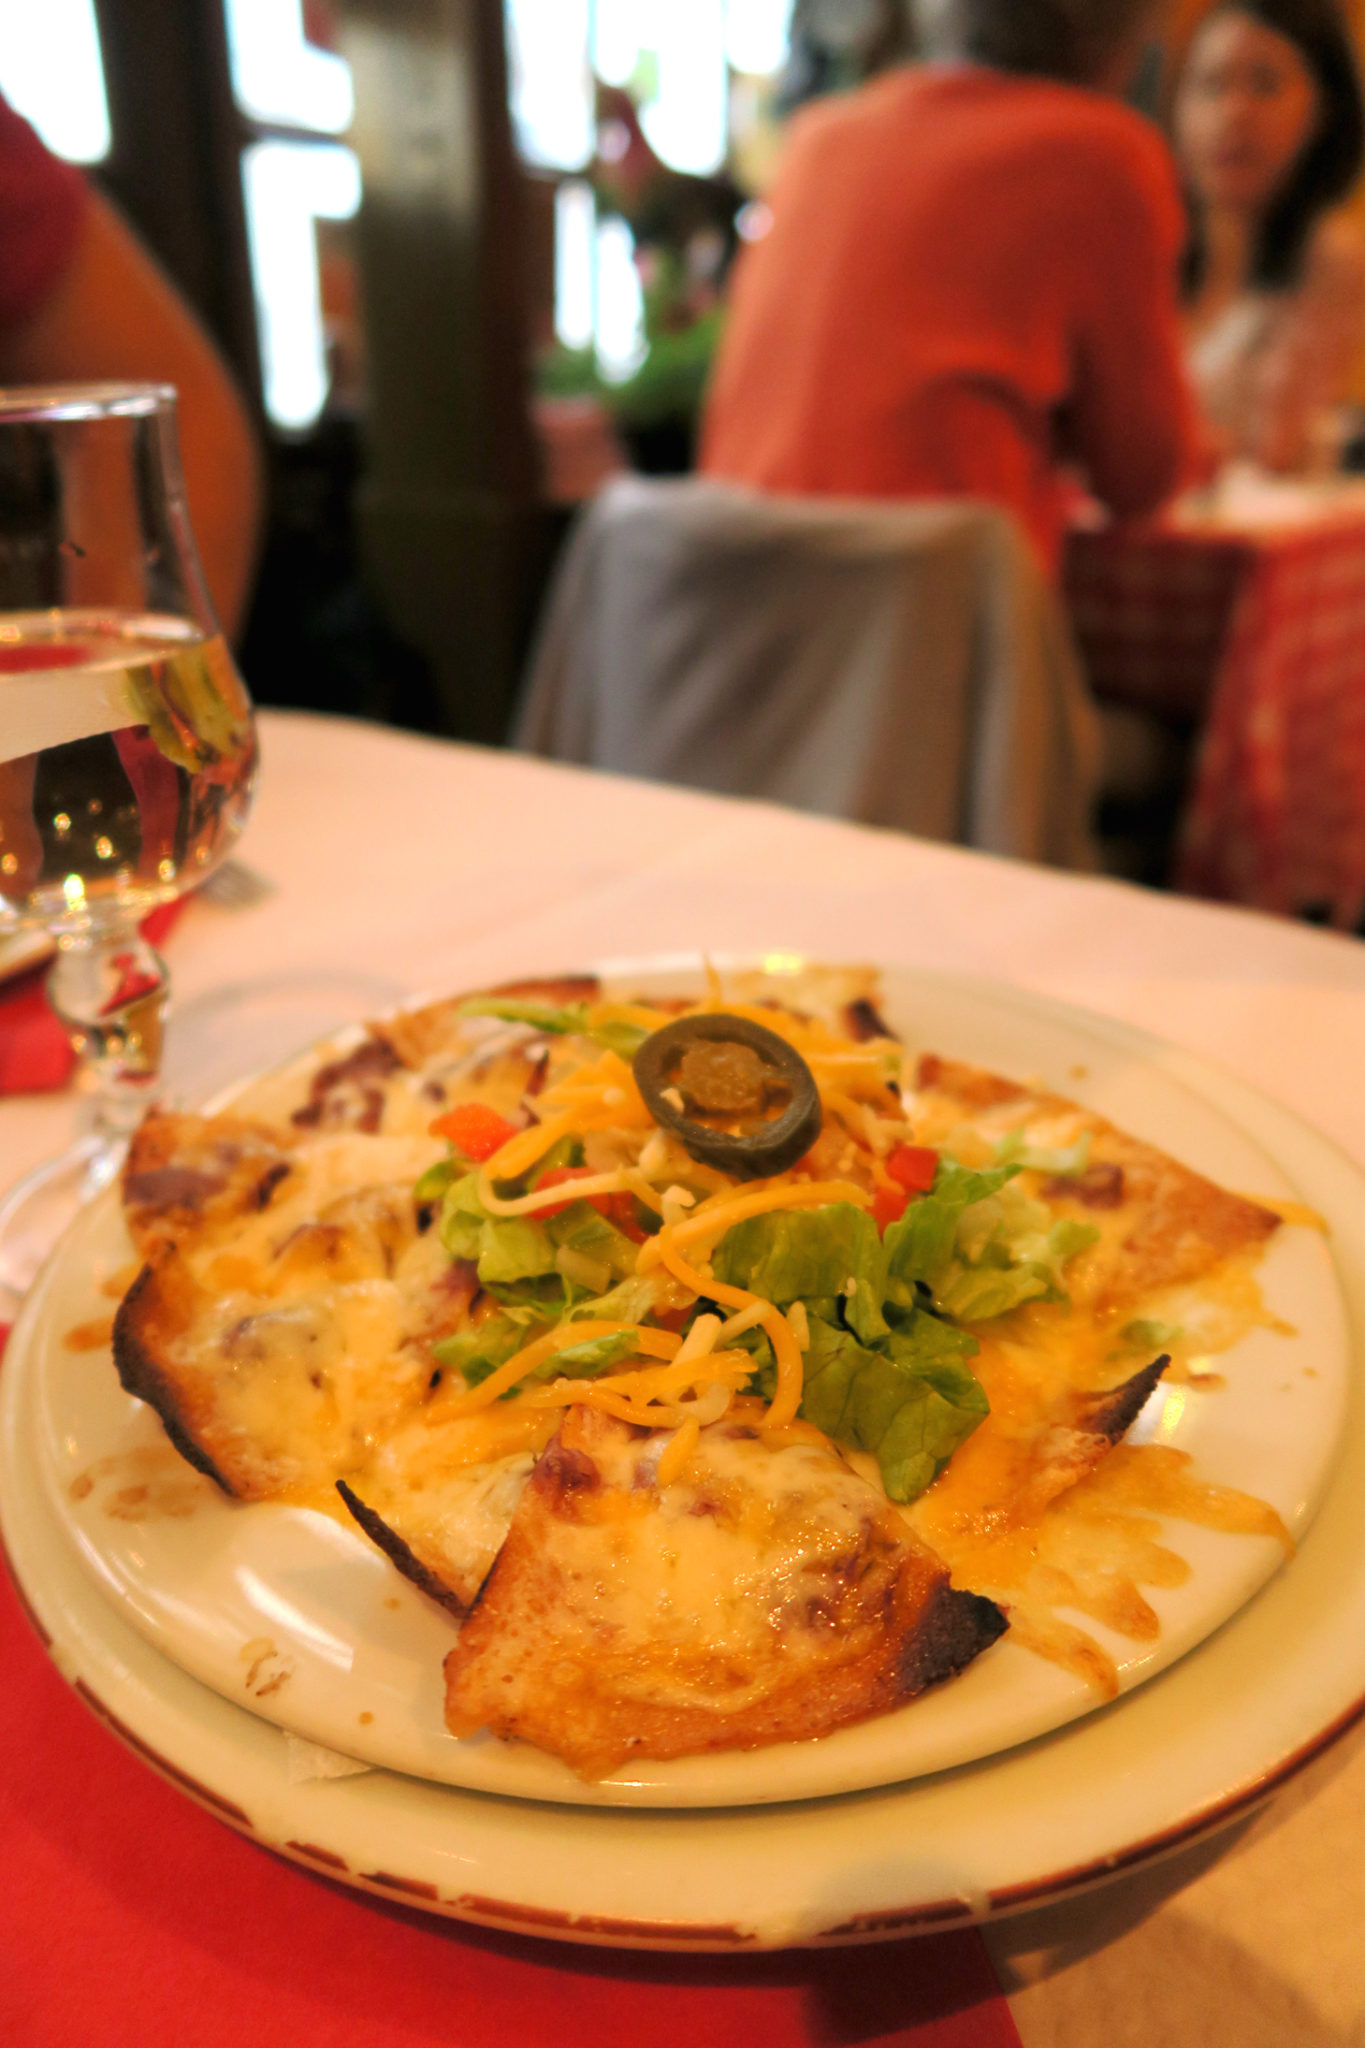 Hema_O_Mexico_assiette_vegetarienne_paris_restaurant_cuisine_monde